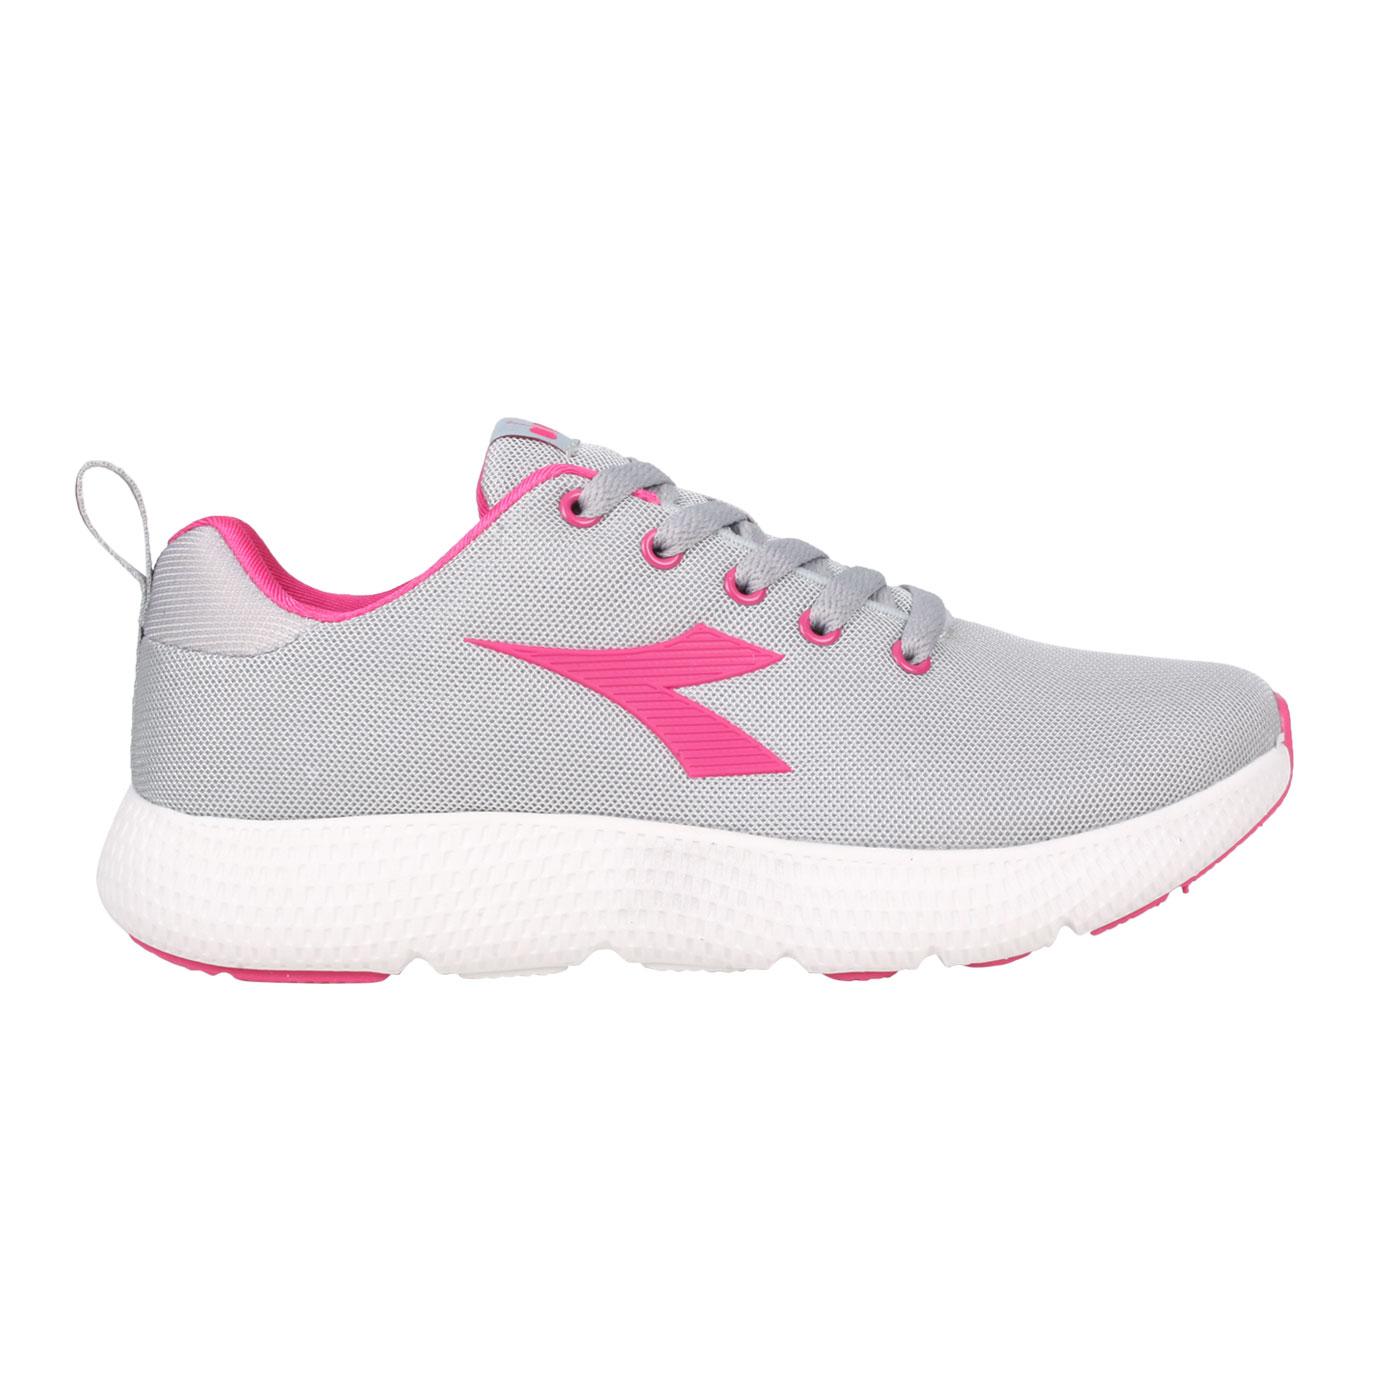 DIADORA 女款專業輕量慢跑鞋 DA31659 - 灰桃紅